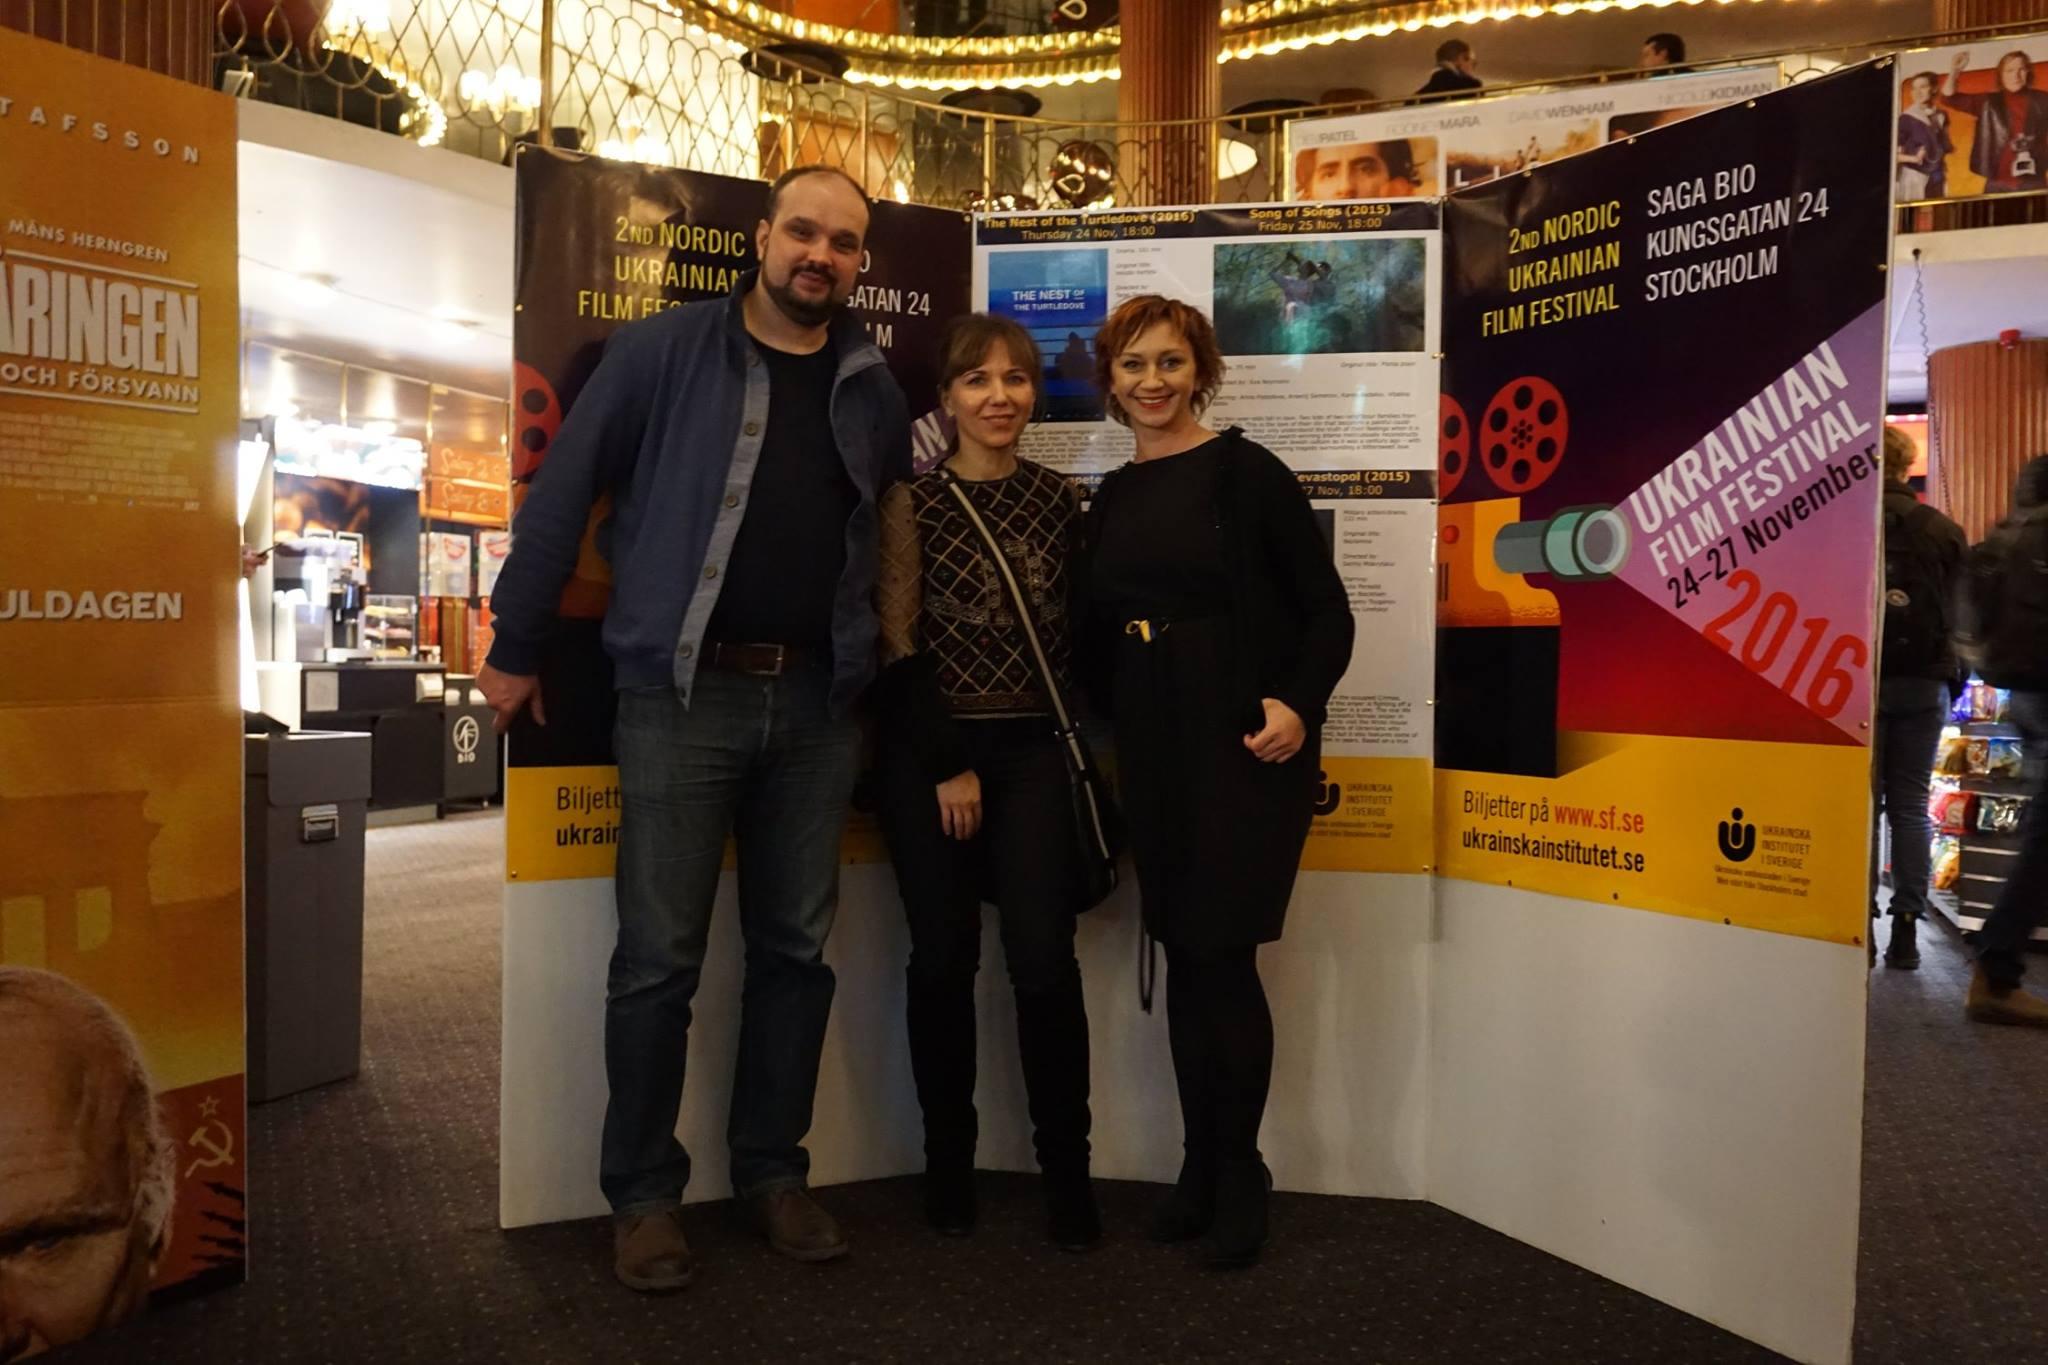 161124_27 2nd Nordic Ukrainian Film Festival 2